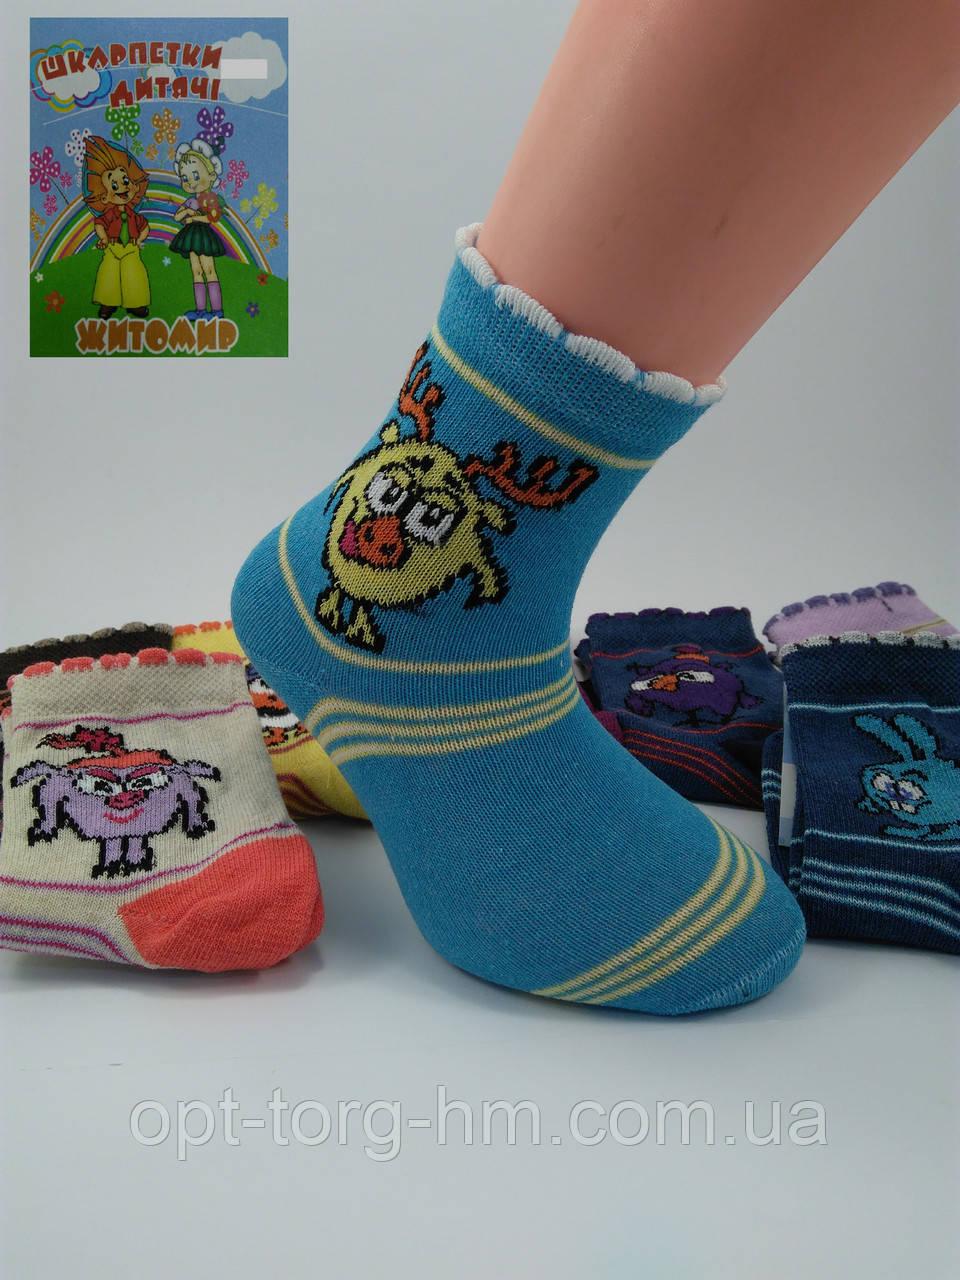 Детские носки 12-14 (19-22 обувь) Смешарики микс